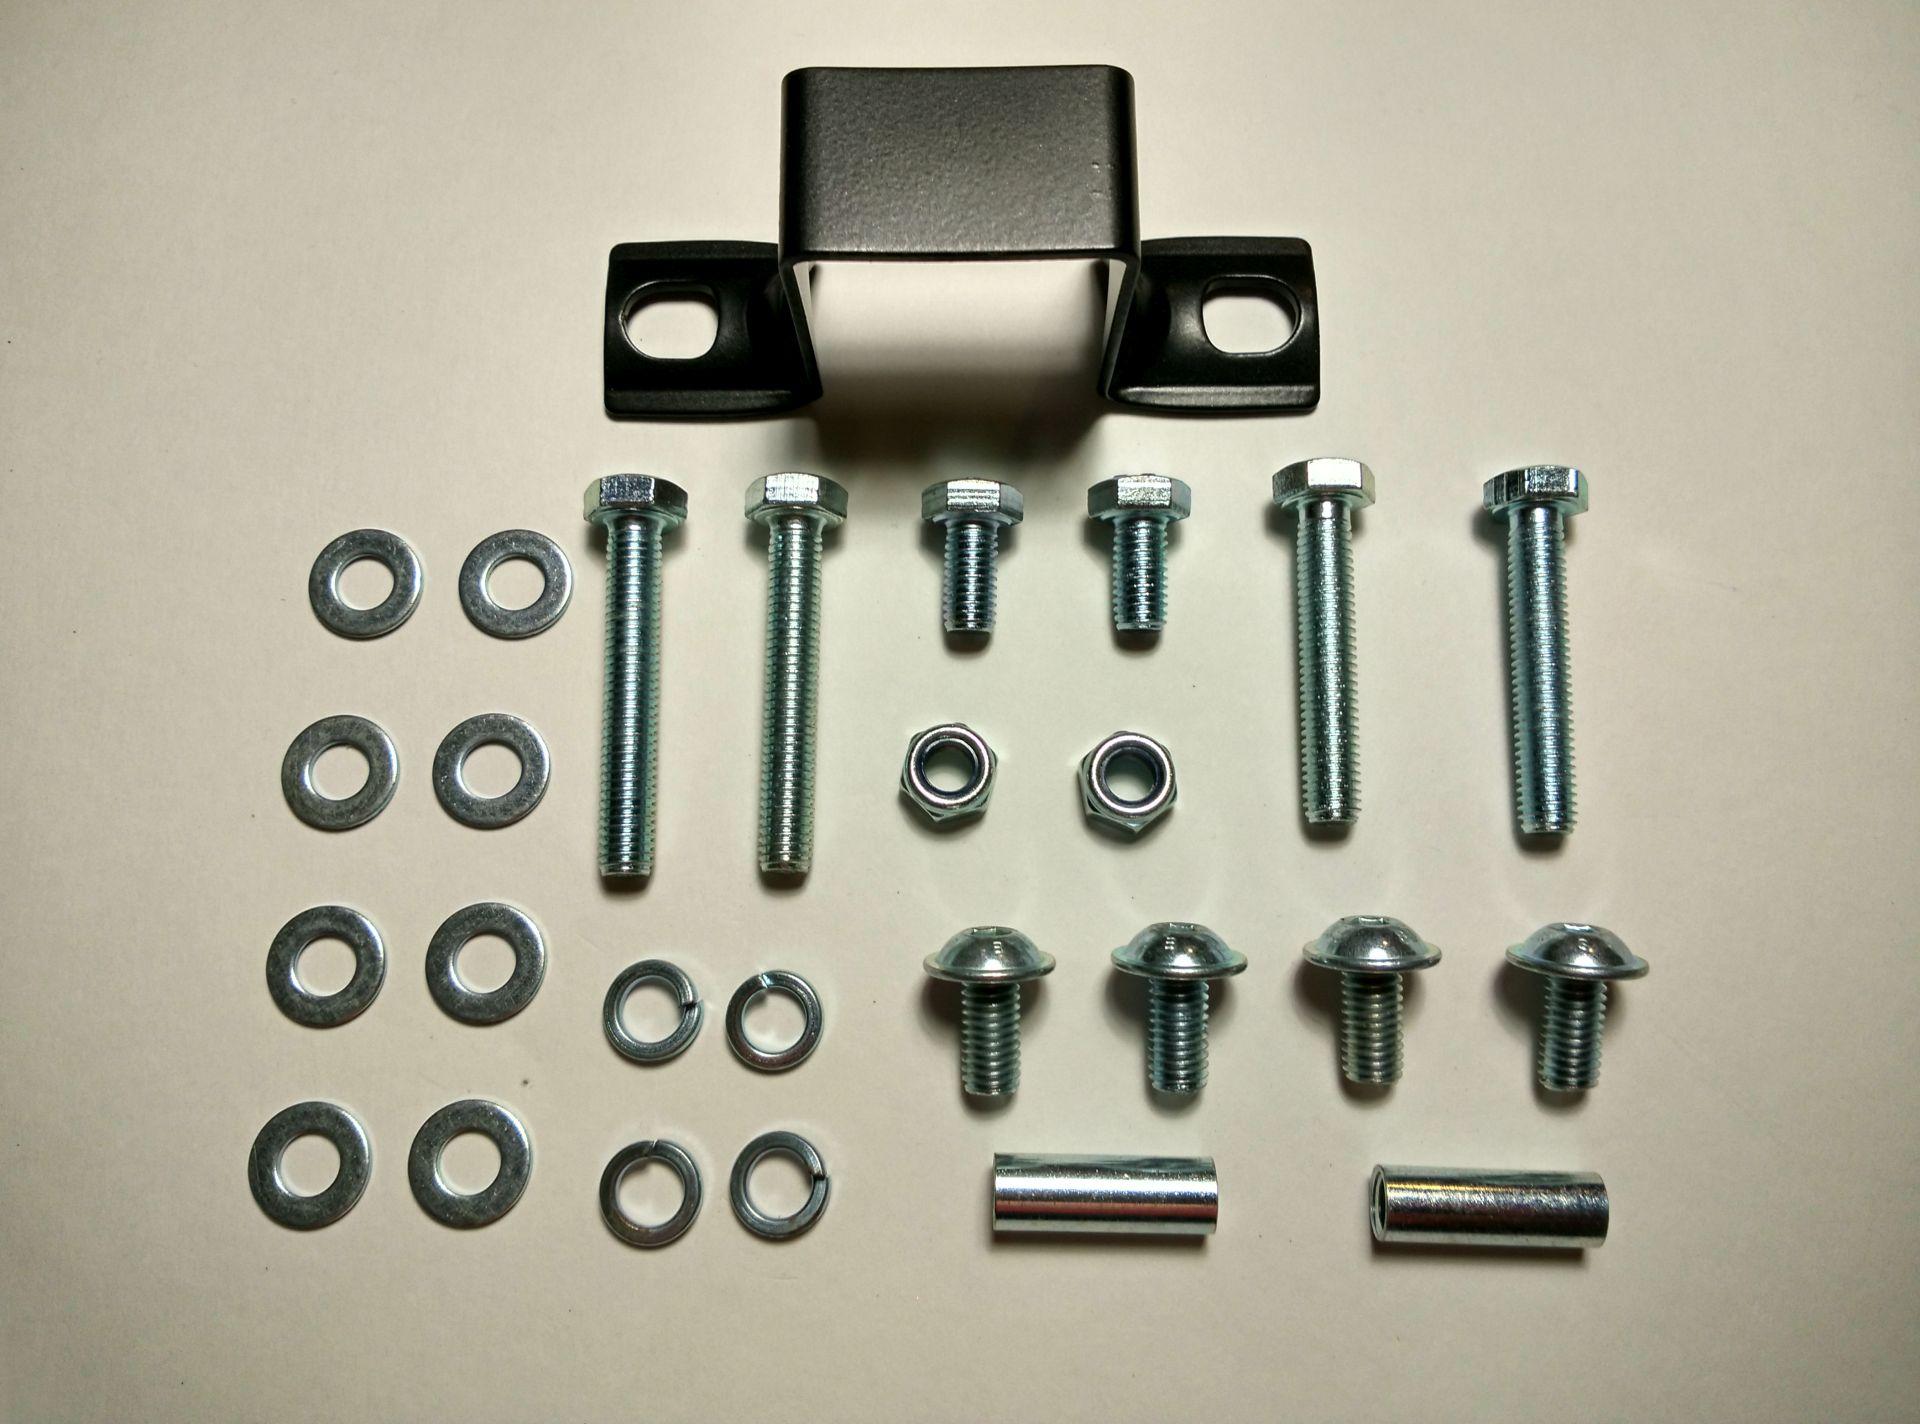 Roll-bar - Assembly set